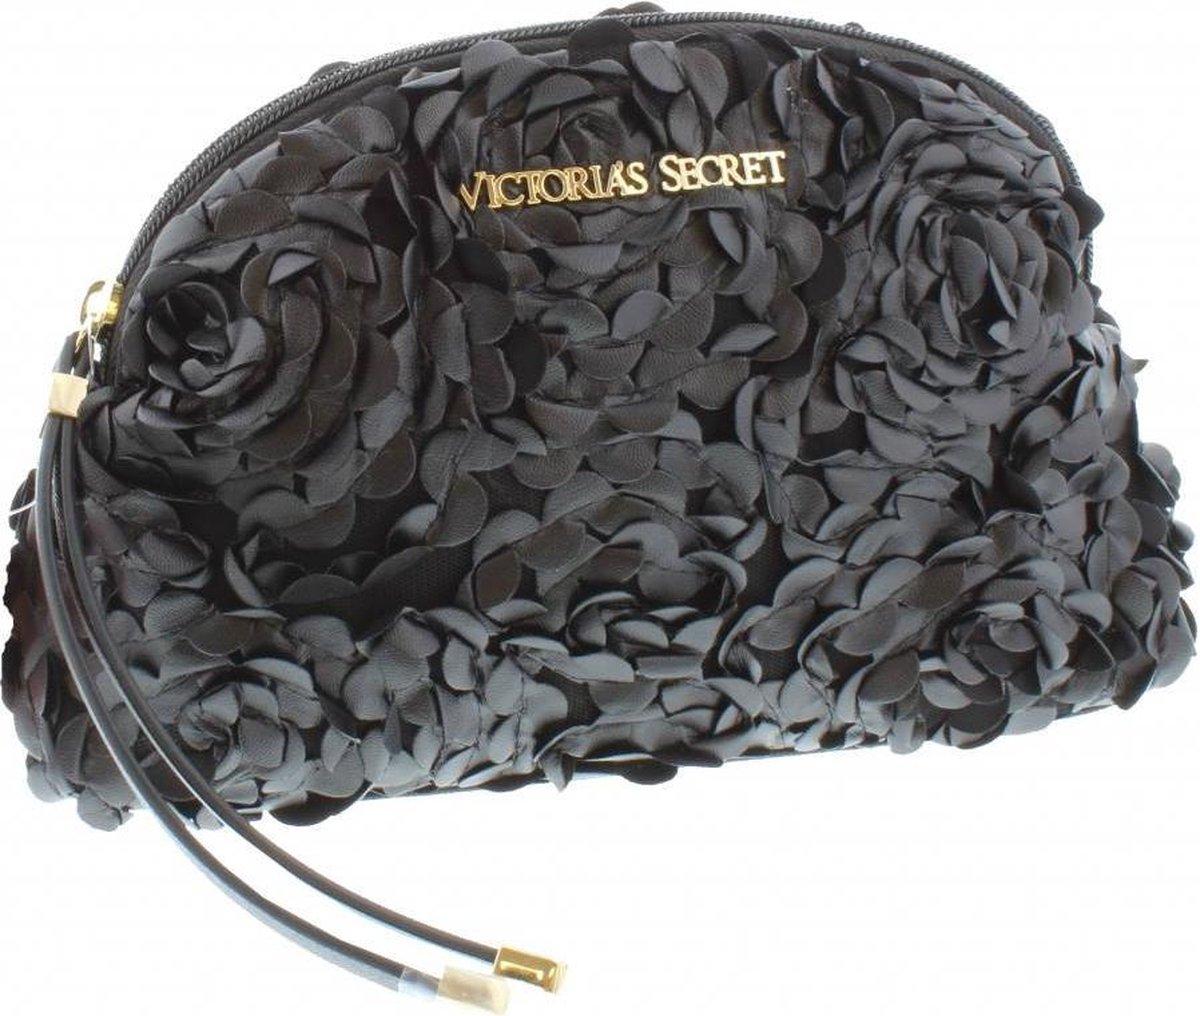 VICTORIA'S SECRET Make up Tasje / Cosmetica tasje - Victoria's Secret